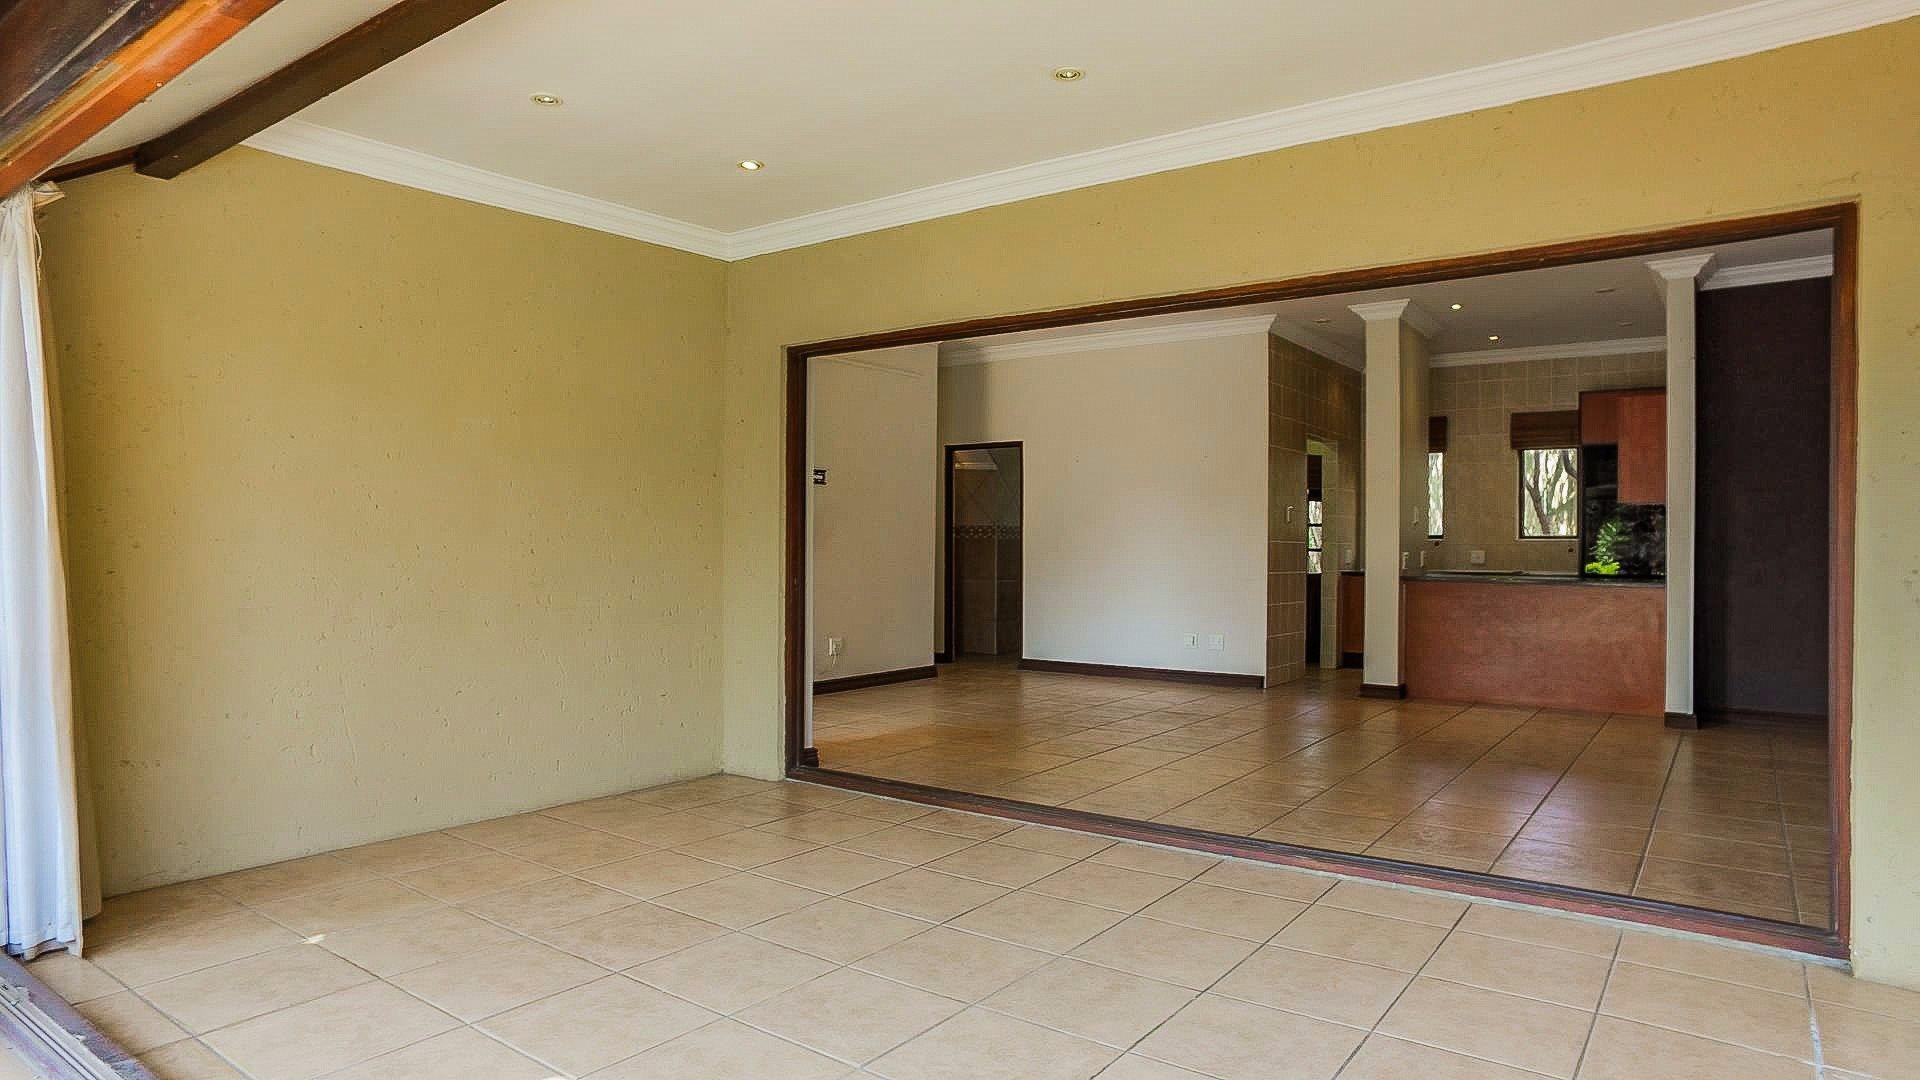 Irene View Estate property for sale. Ref No: 13519995. Picture no 13